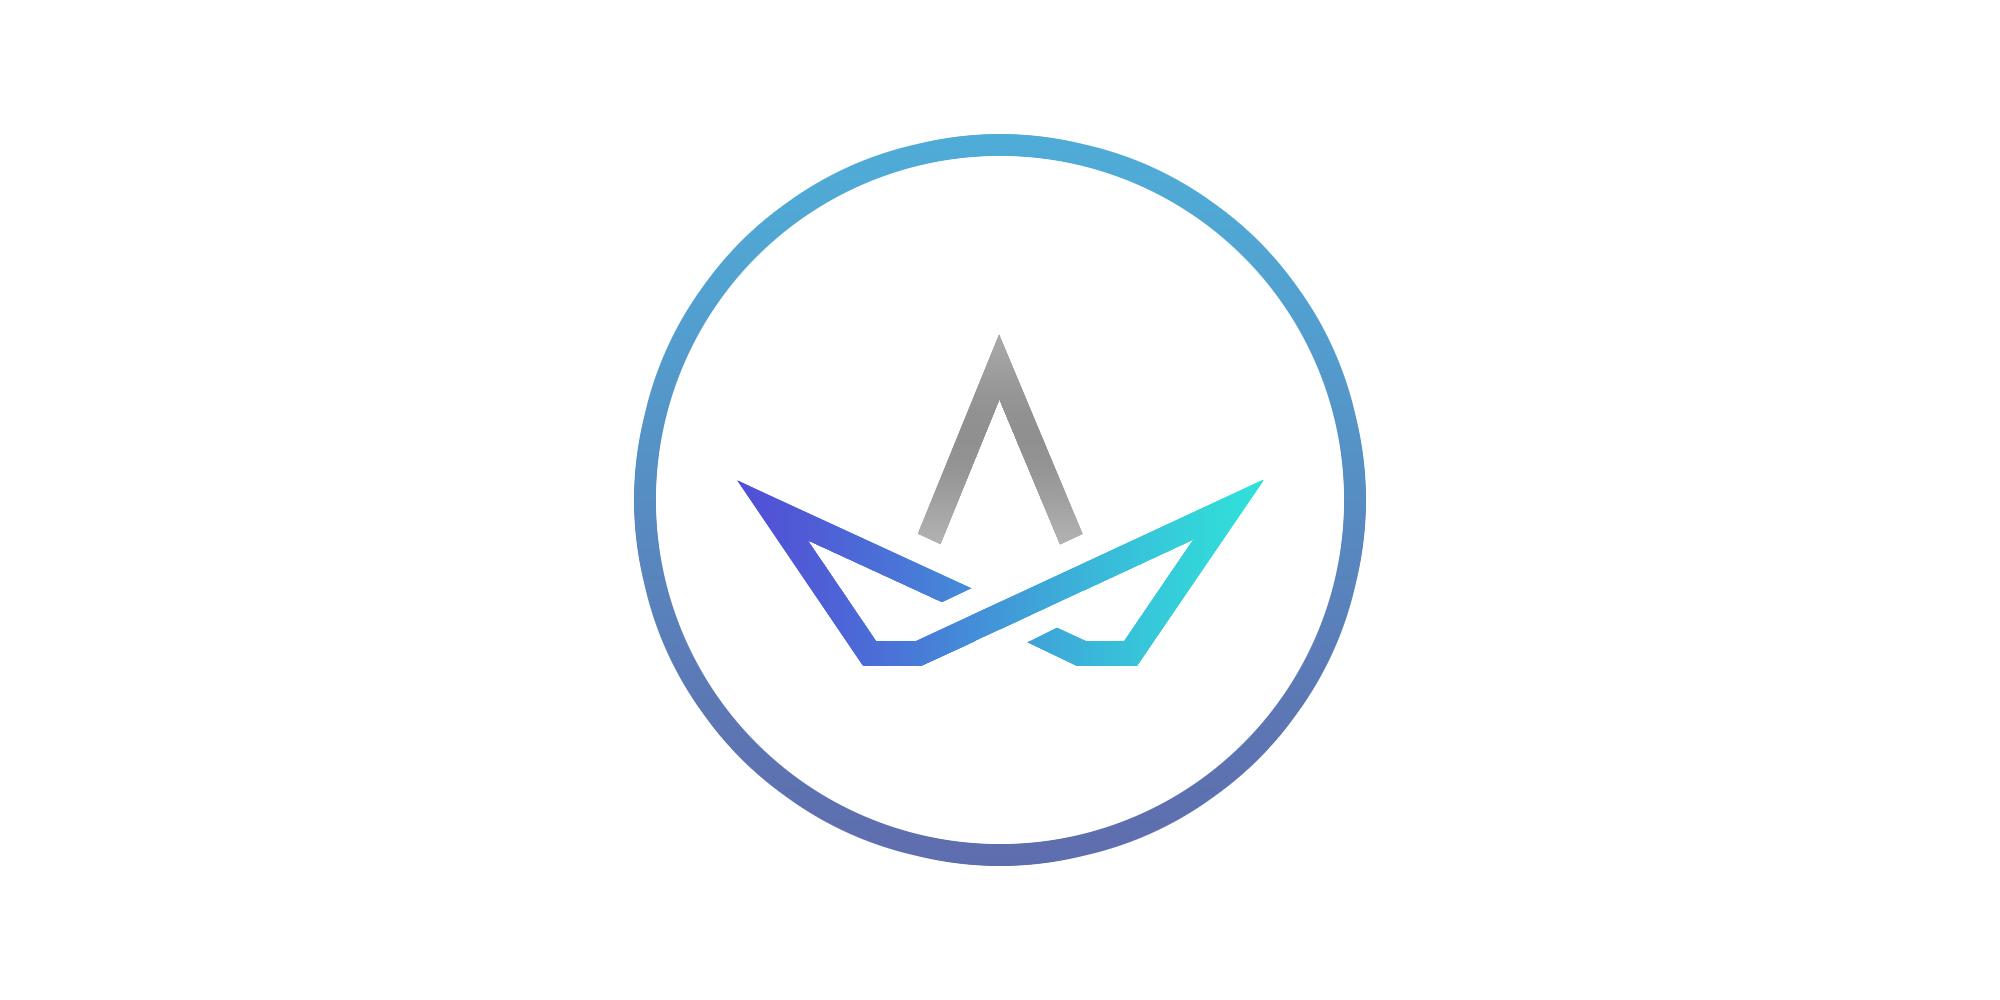 https://www.airsoftaus.com.au/wp-content/plugins/kingcomposer/assets/images/get_start.jpg